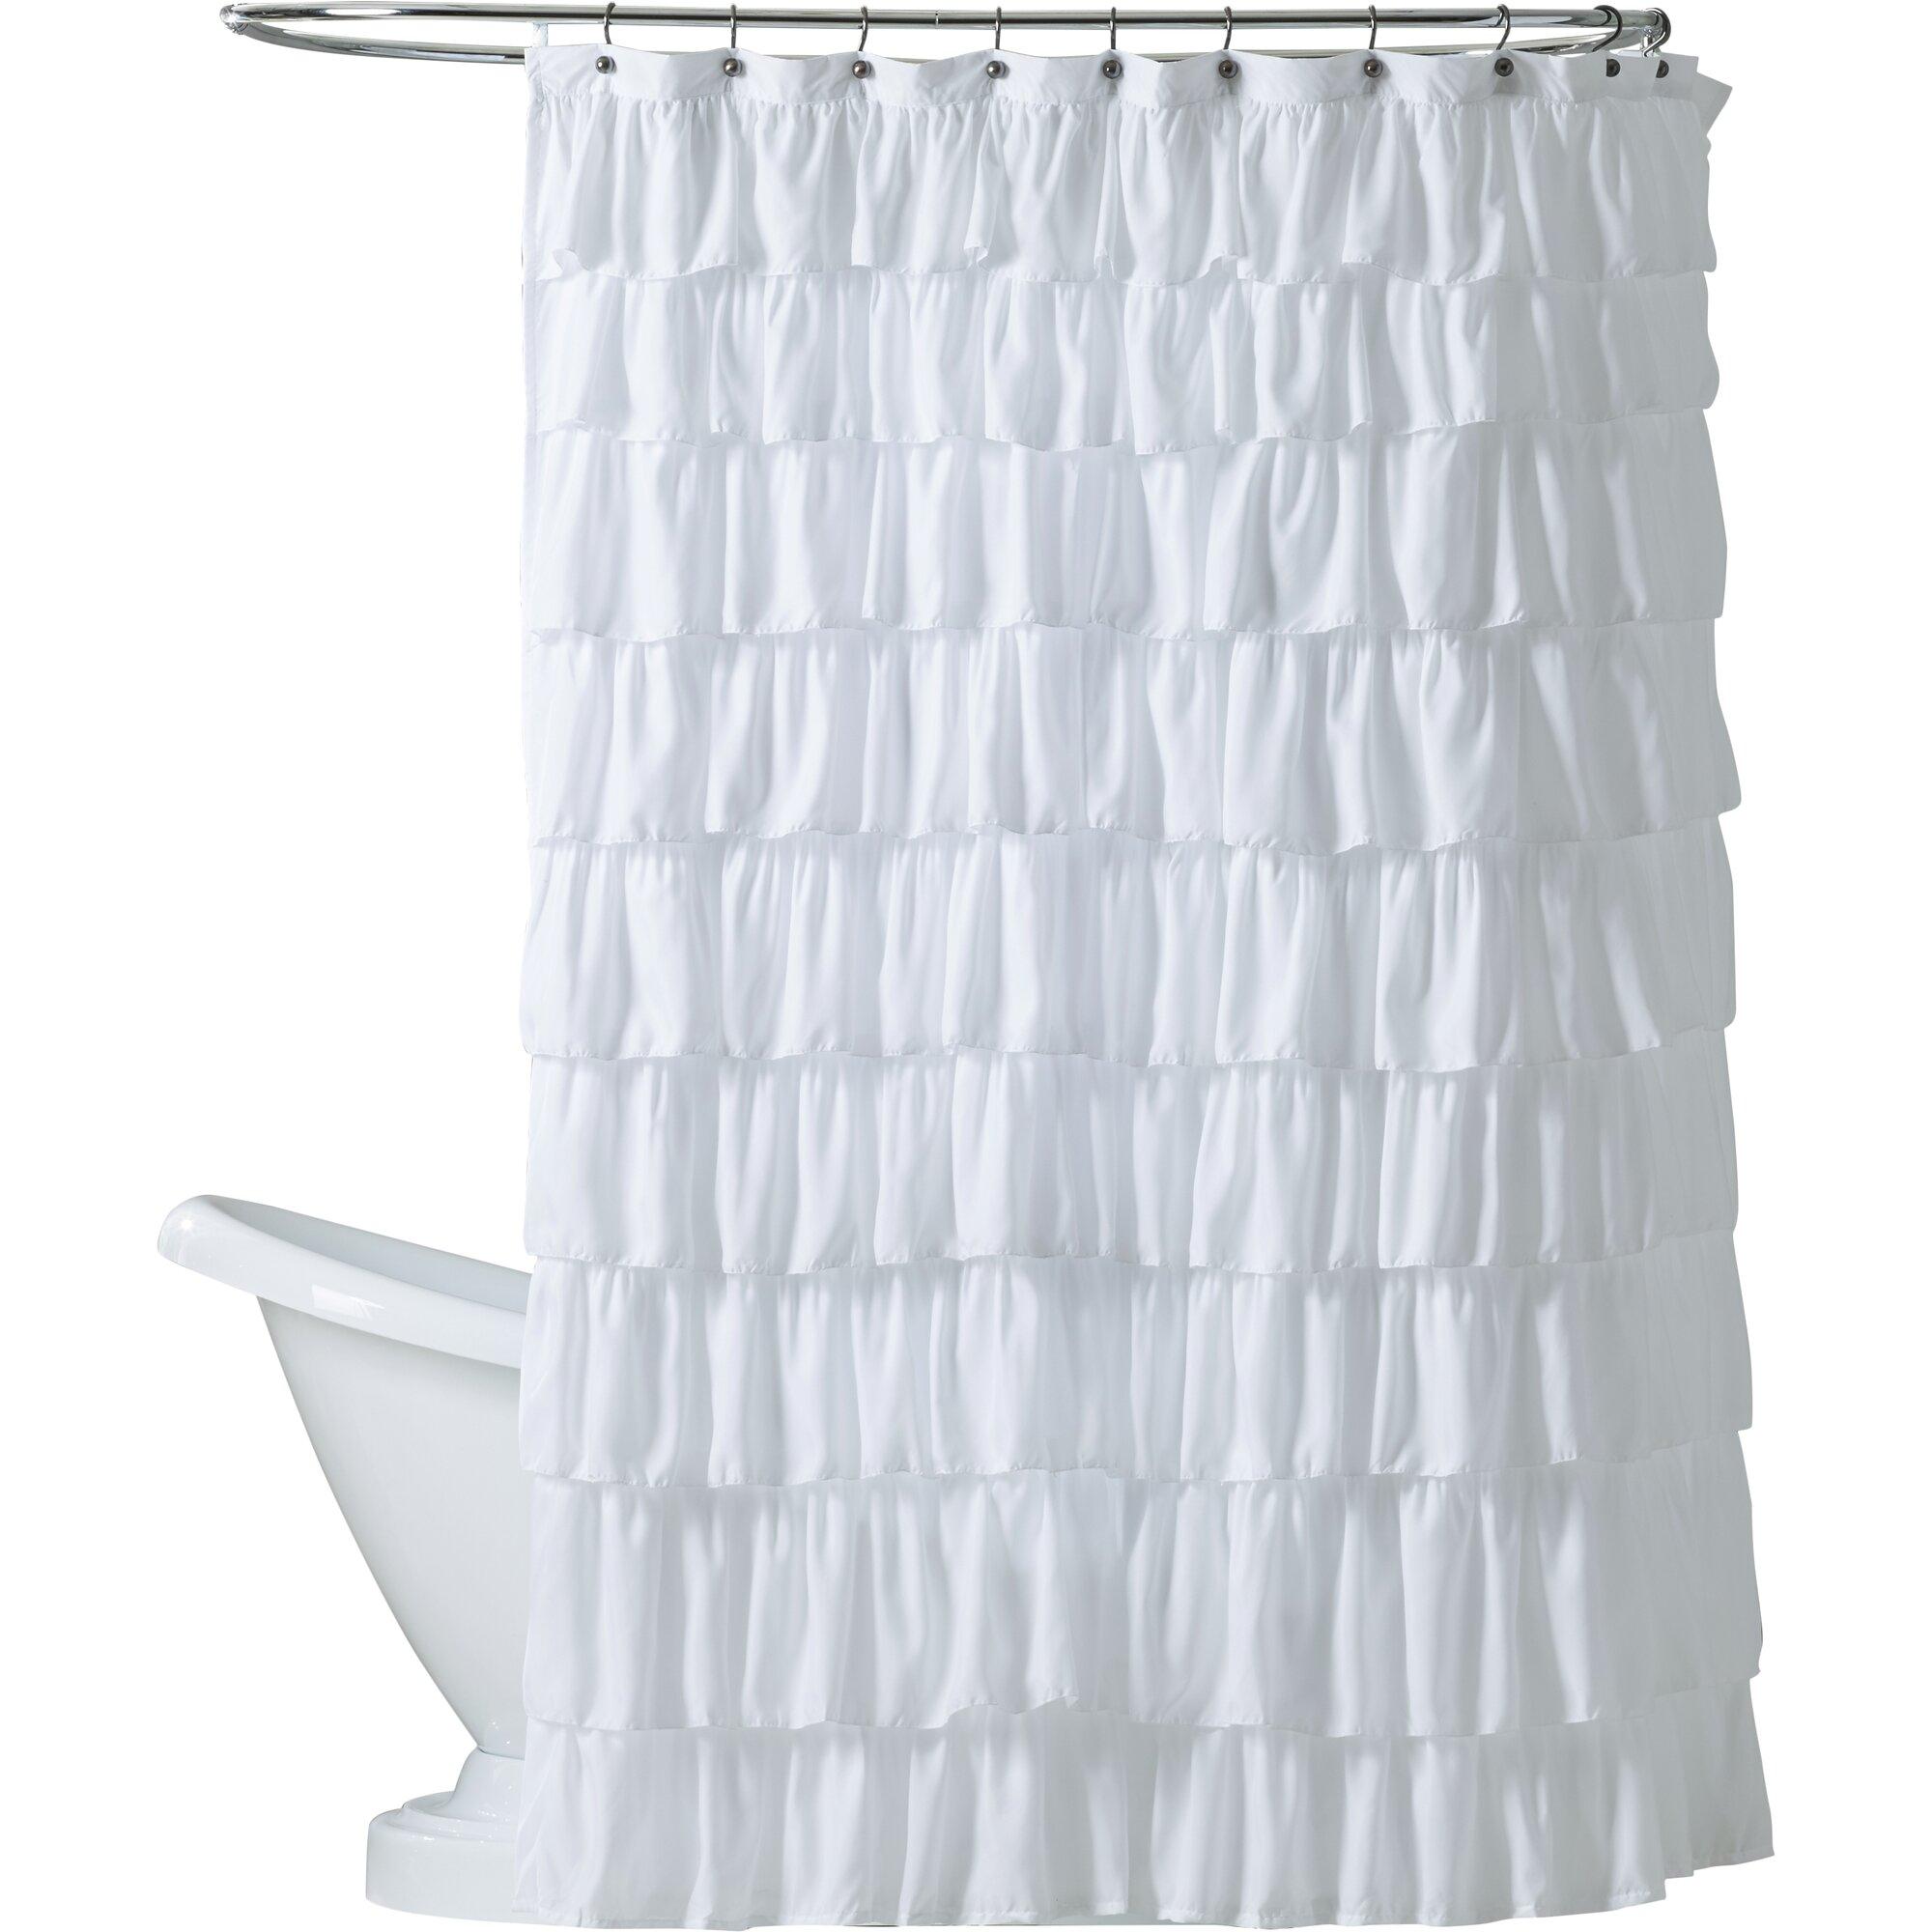 Bathroom plastic curtains - Bathroom Plastic Curtains 49